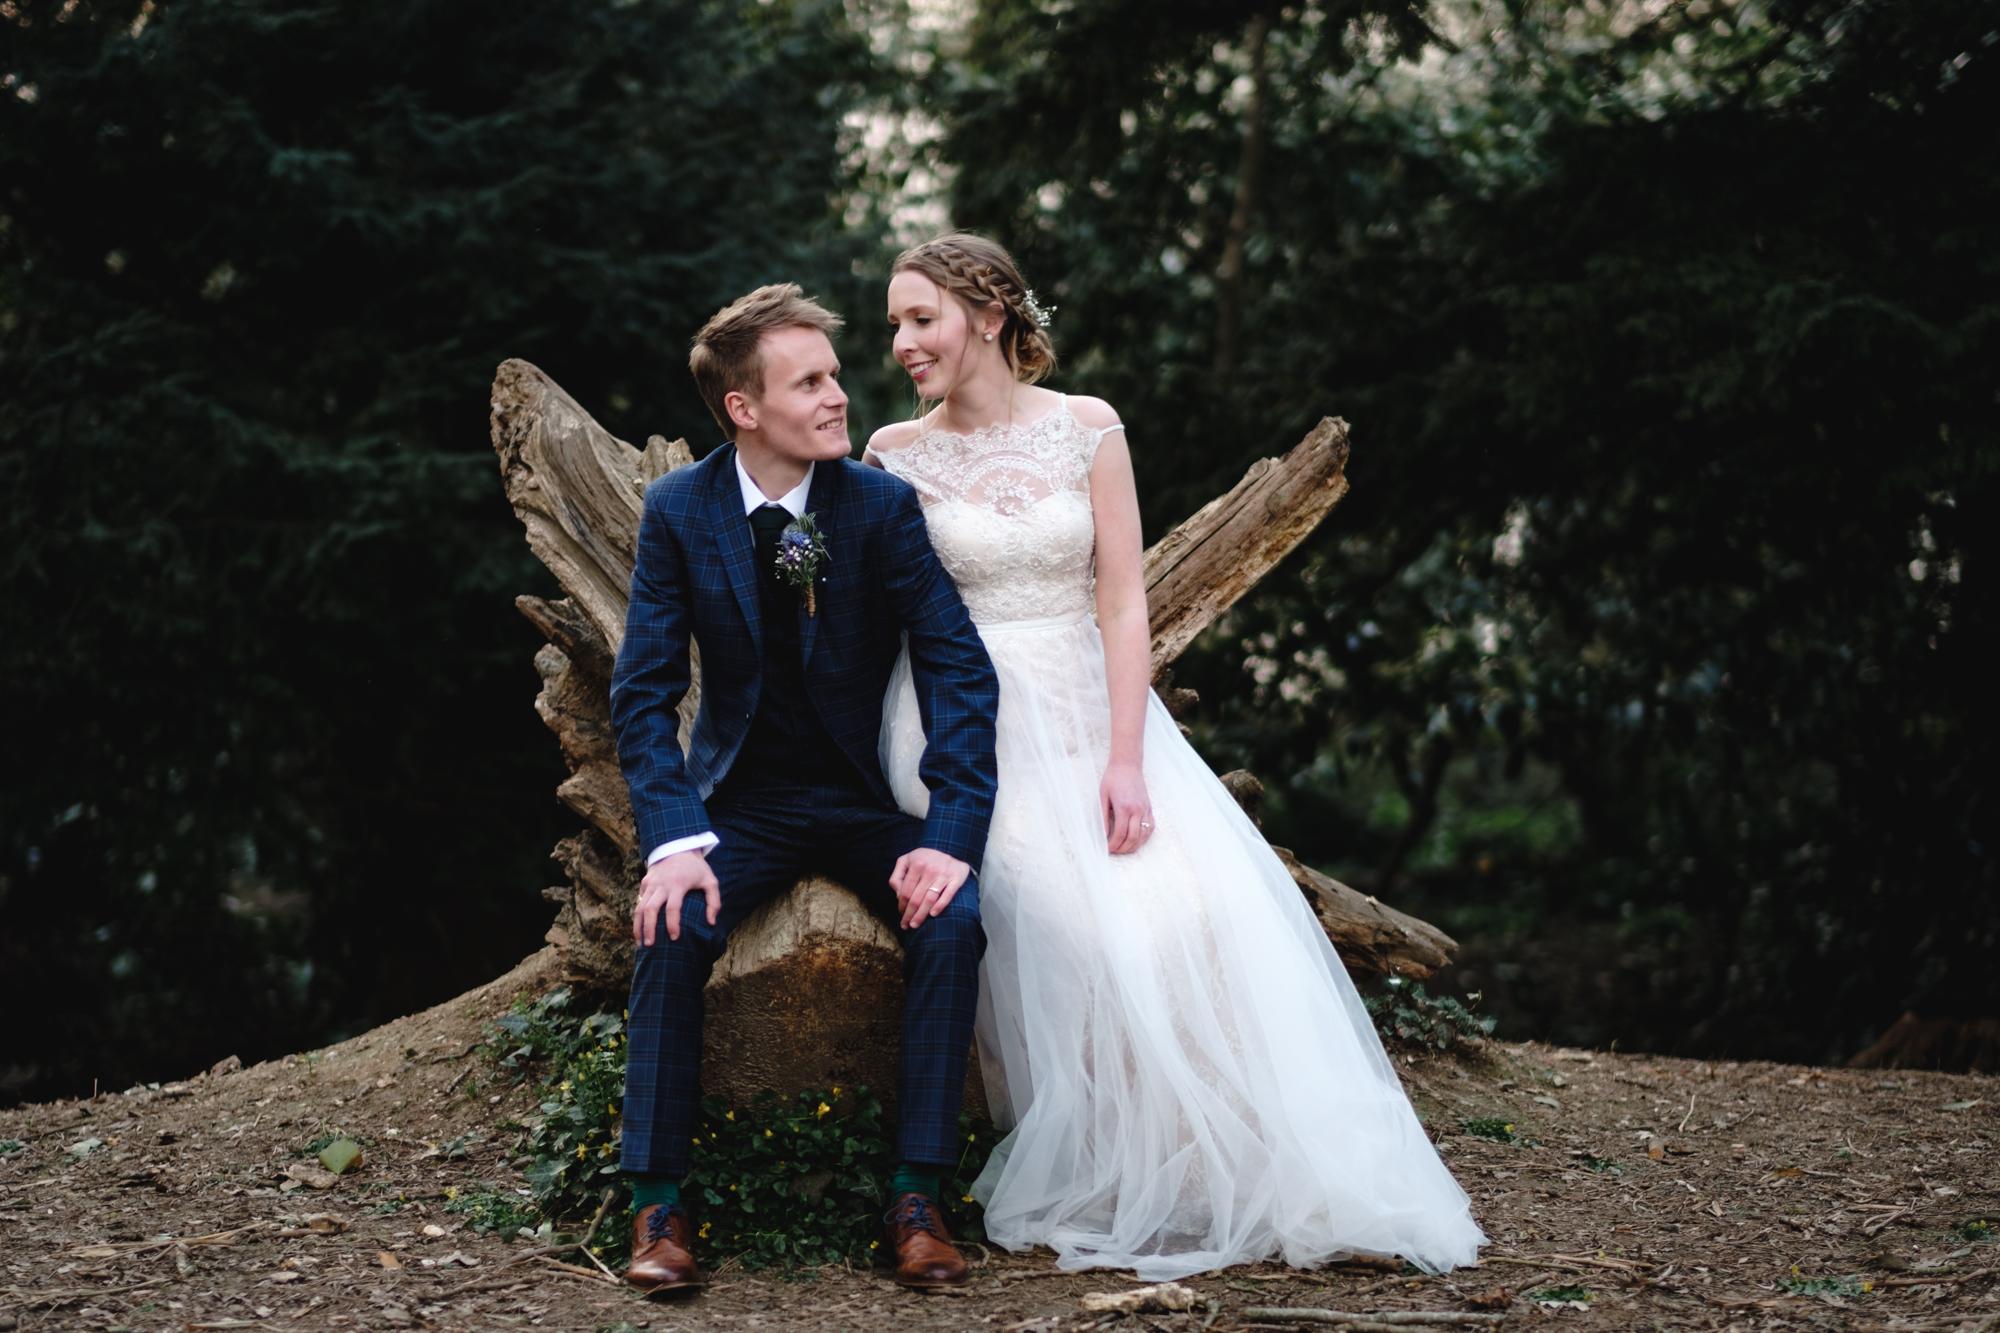 Katie and Dode weddings (180 of 207).jpg